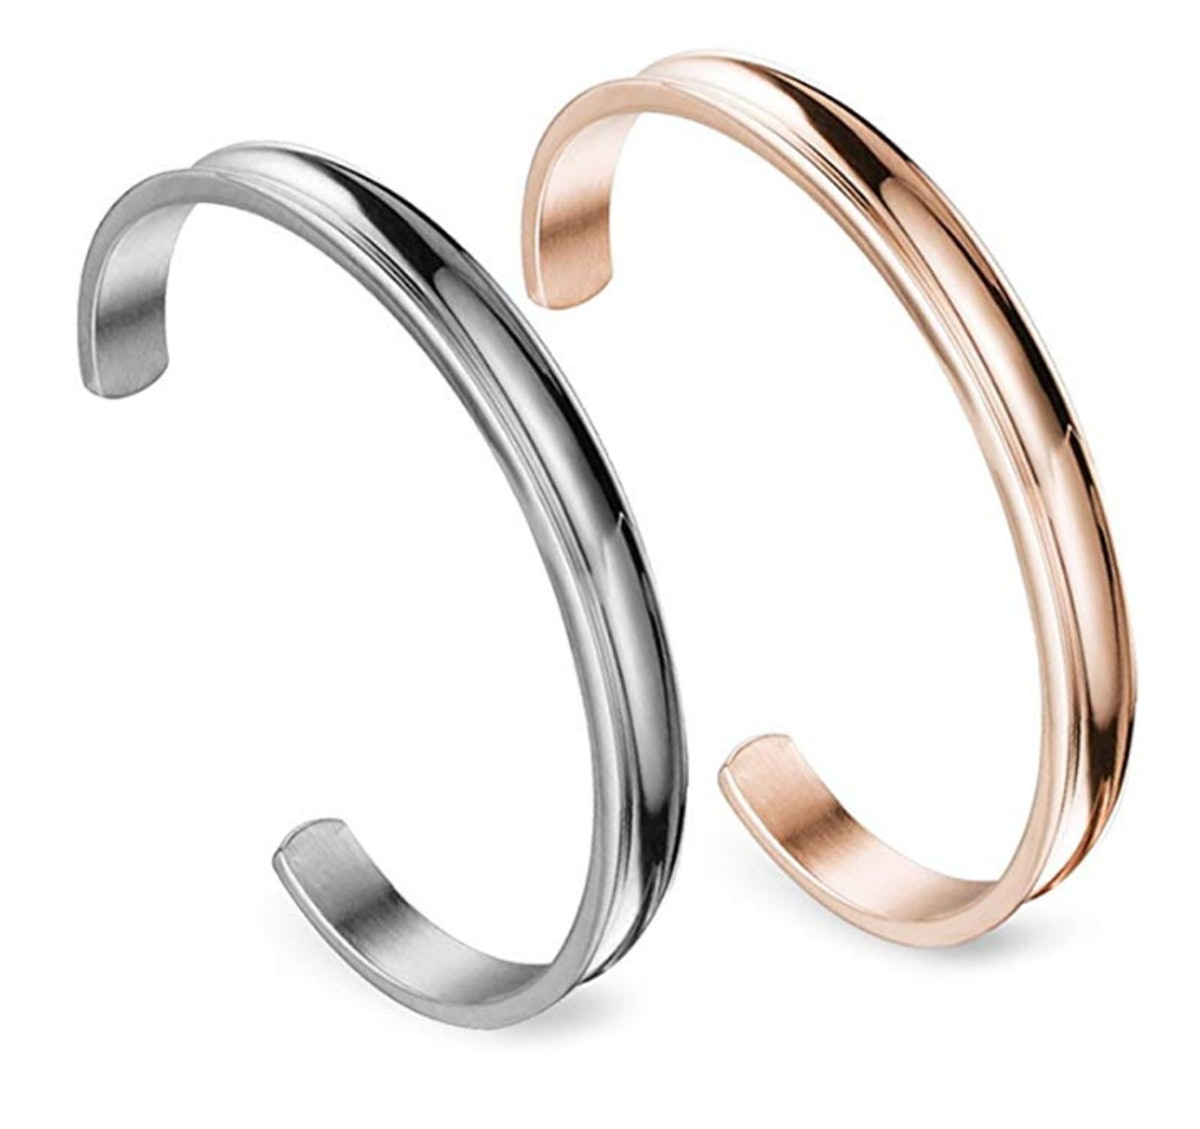 Zuo Bao Stainless Steel Bracelet (2-Pack)